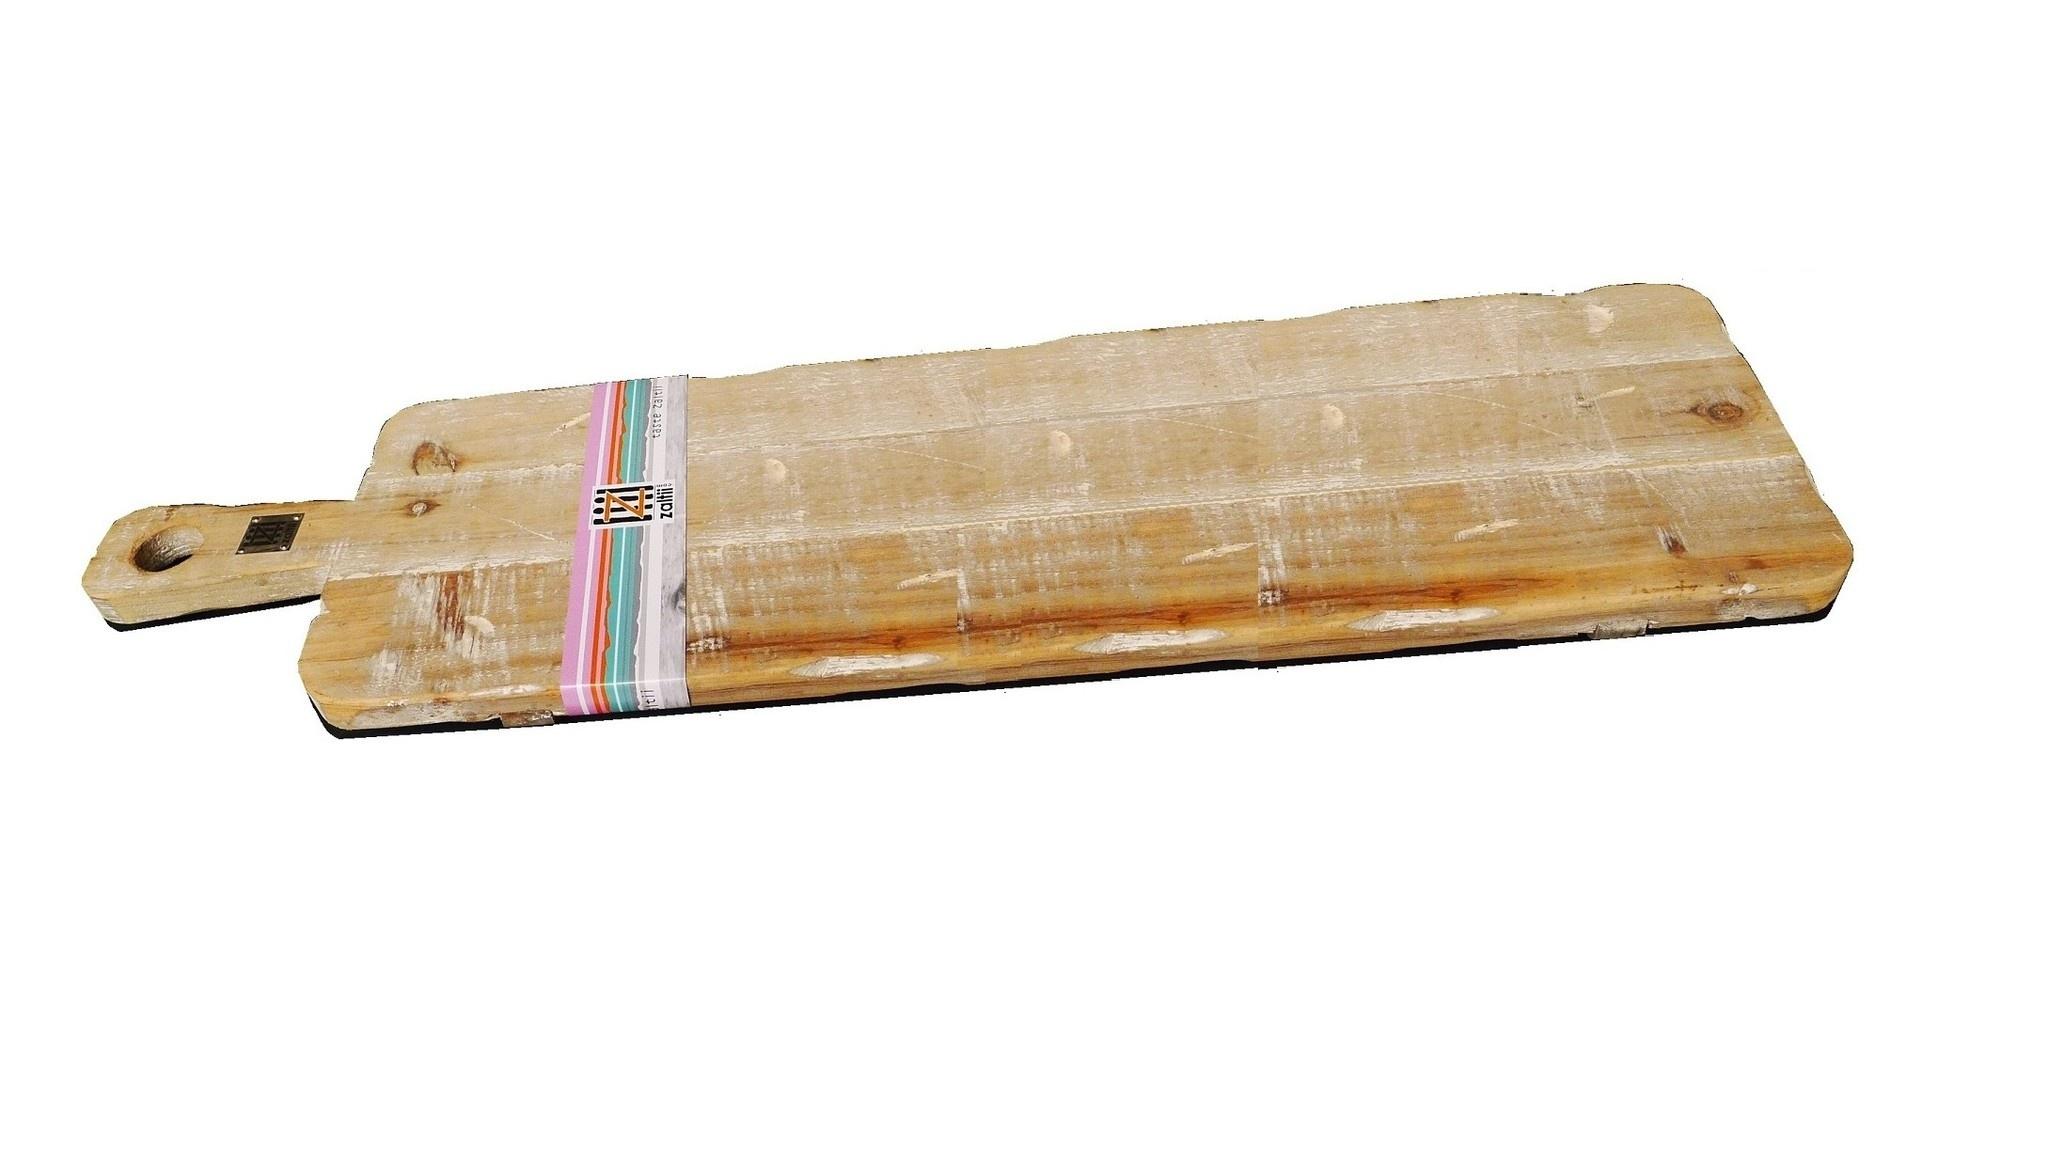 trayold dutchcutting blade 66/20-3